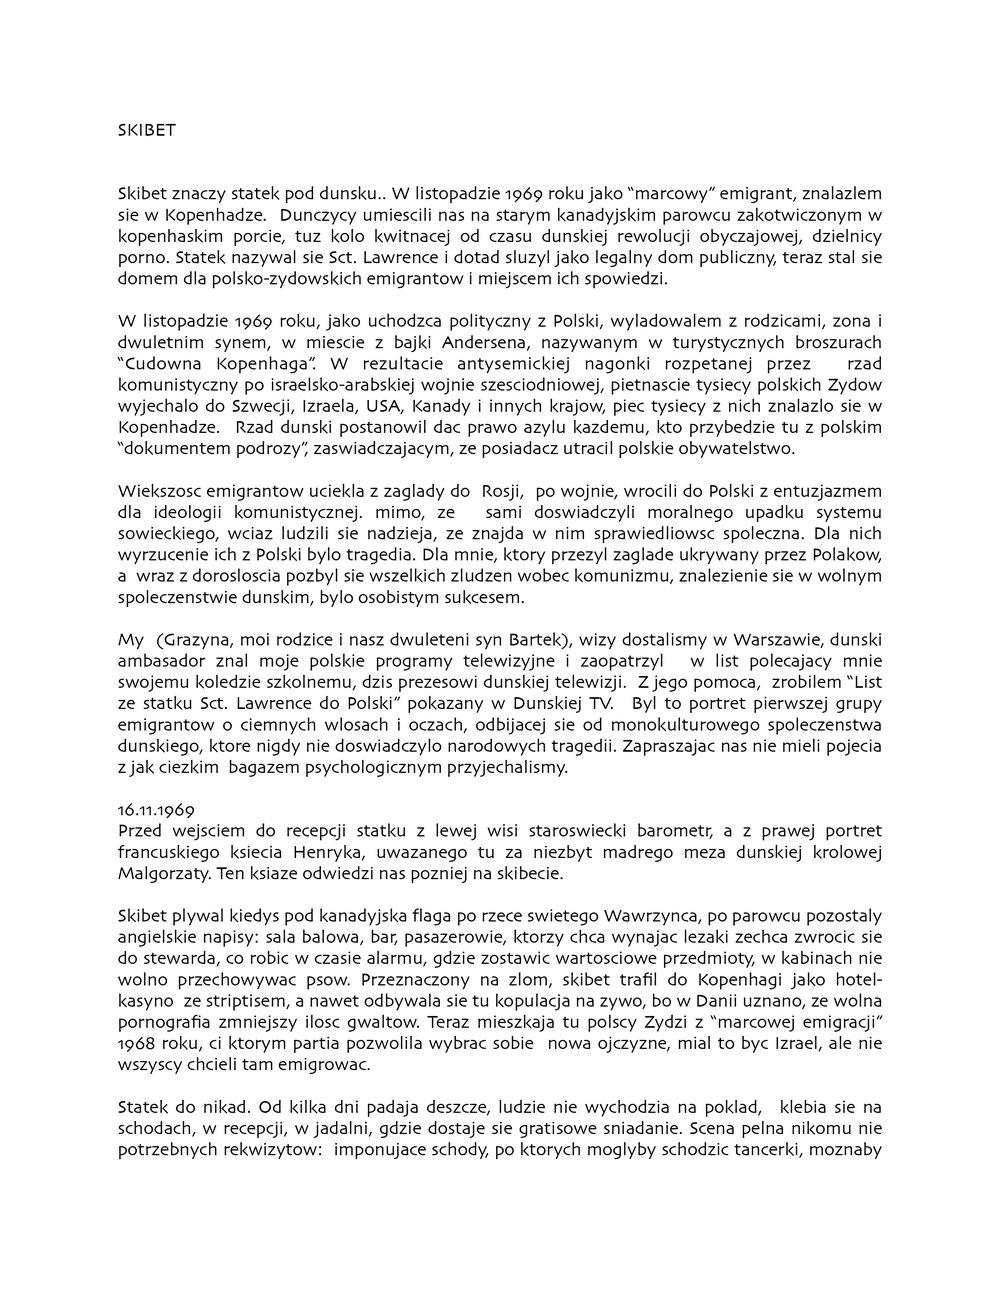 SKIBET-The-Director's-Polish-Diary-1.jpg